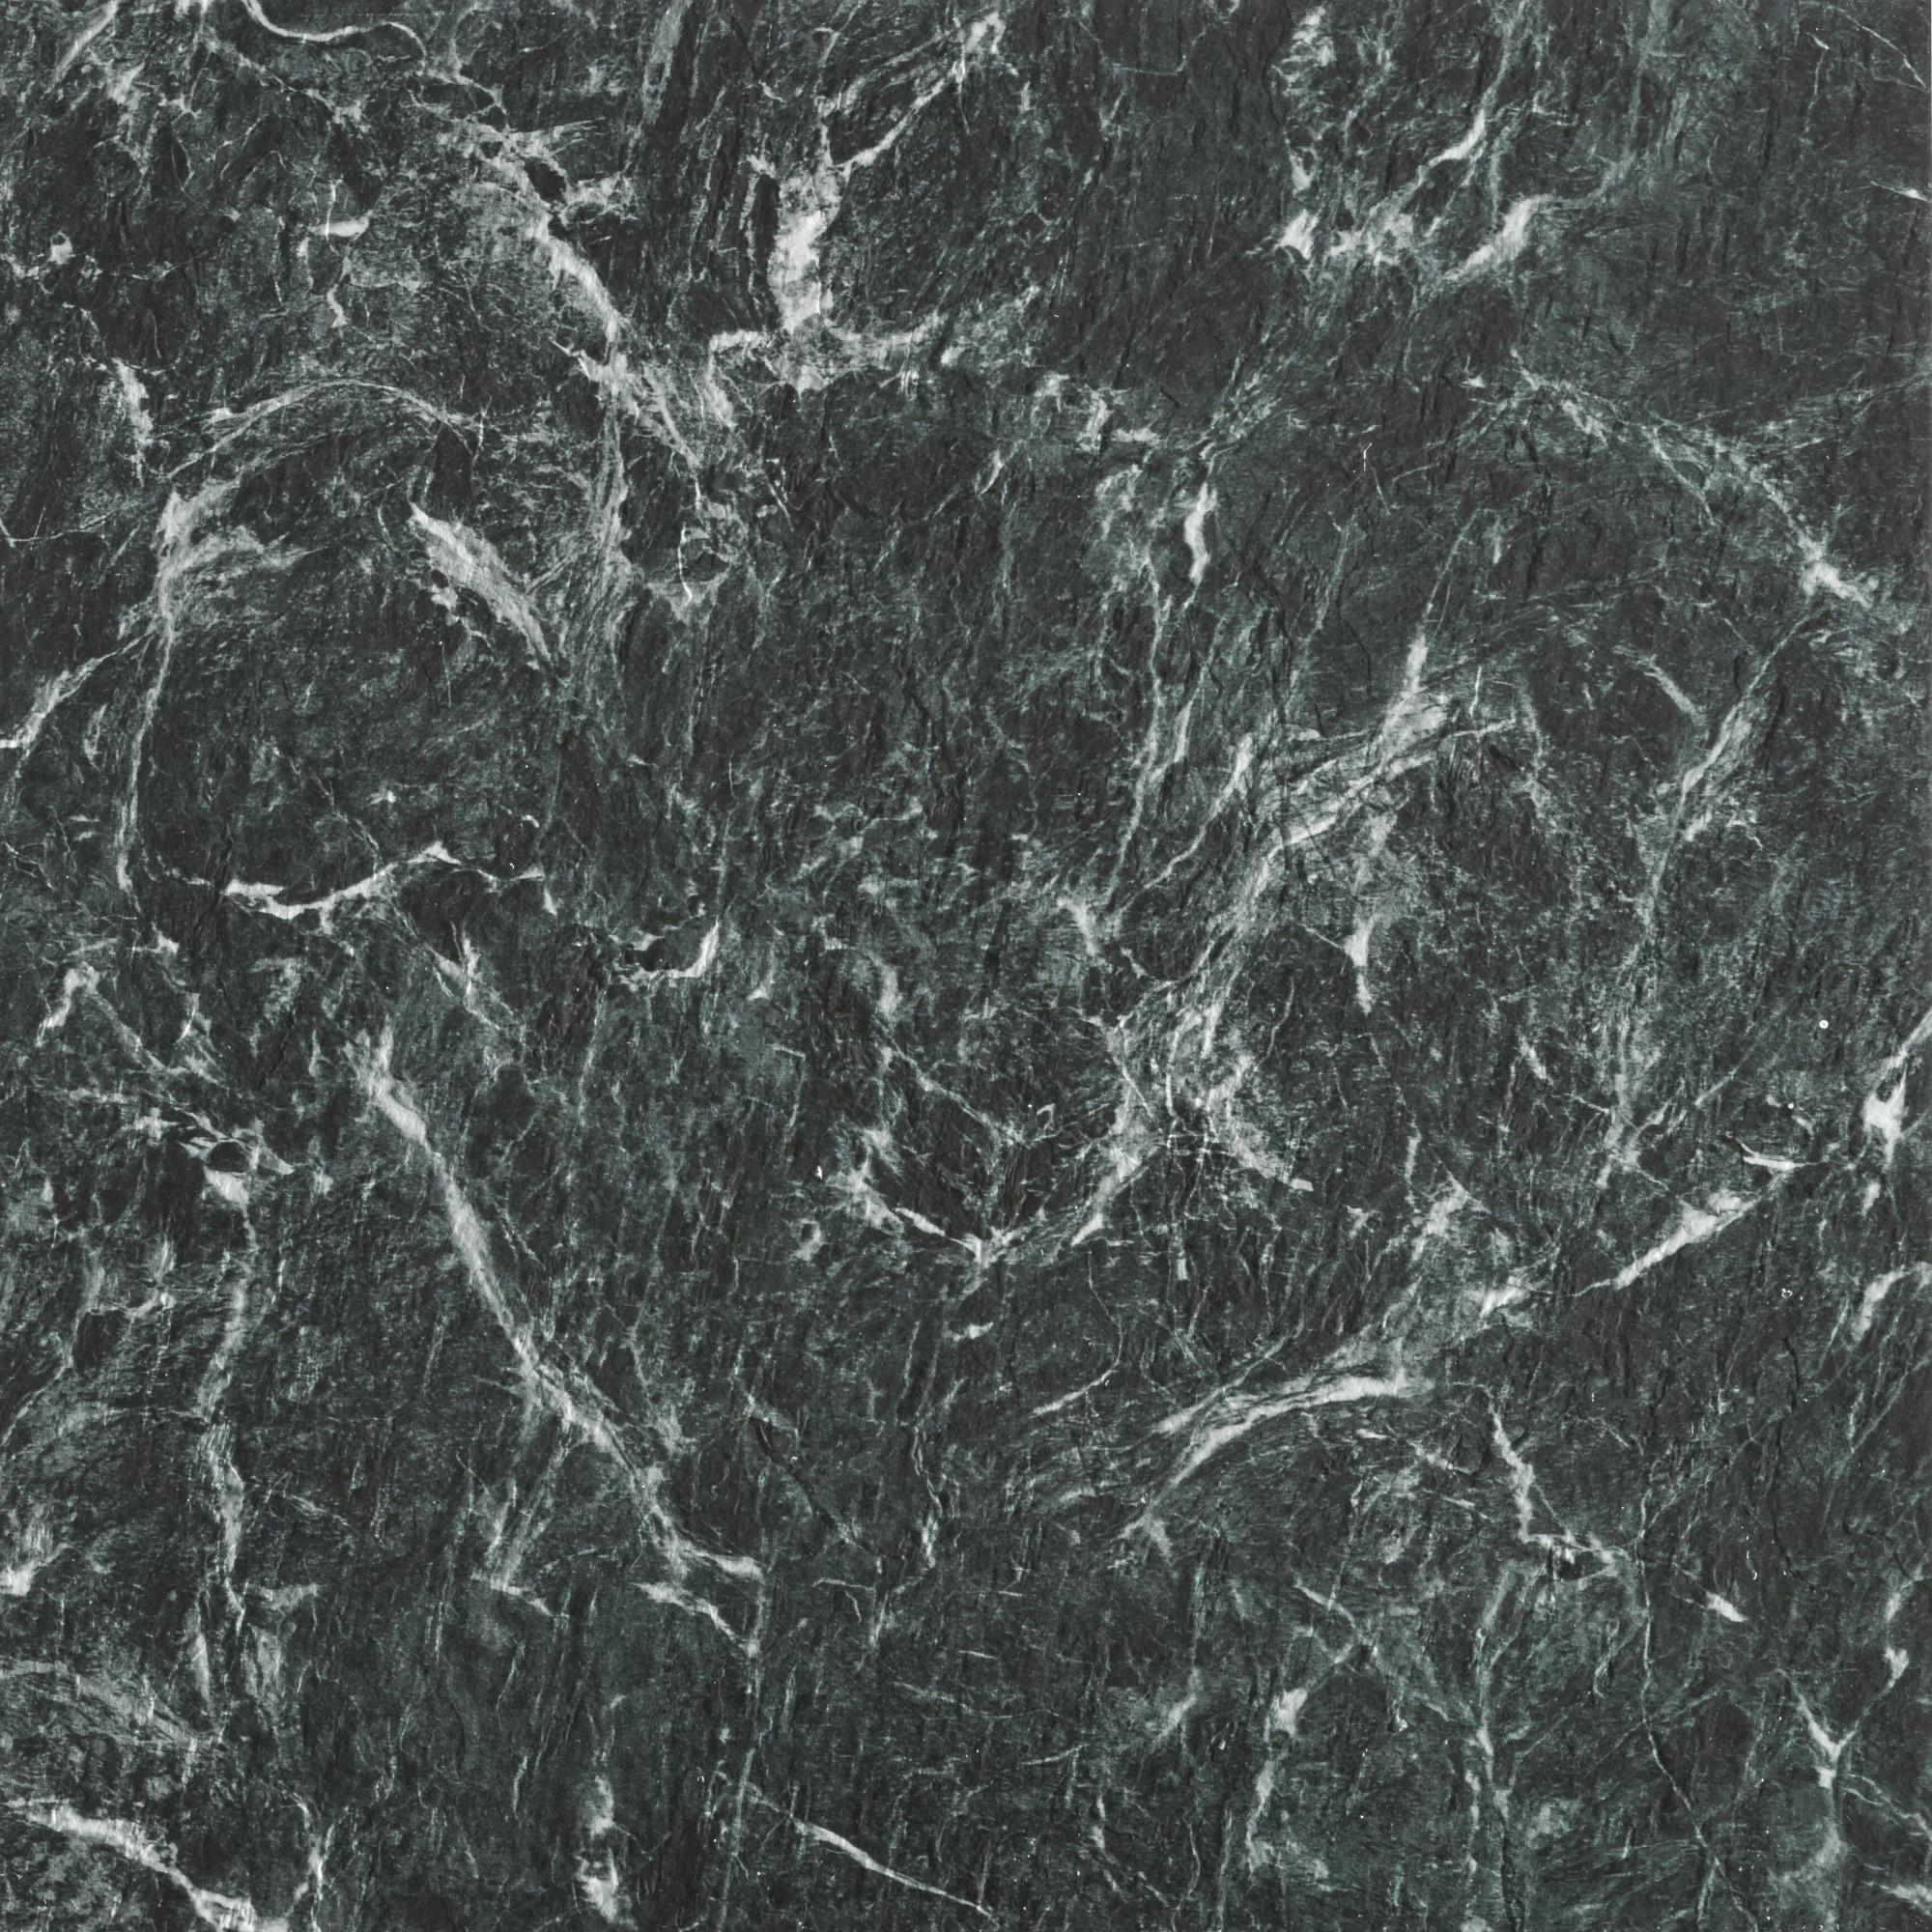 Achim Majestic Verde Green Marble 18x18 Self Adhesive Vinyl Floor Tile 10 Tiles 22 5 Sq Ft Overstock 11820163